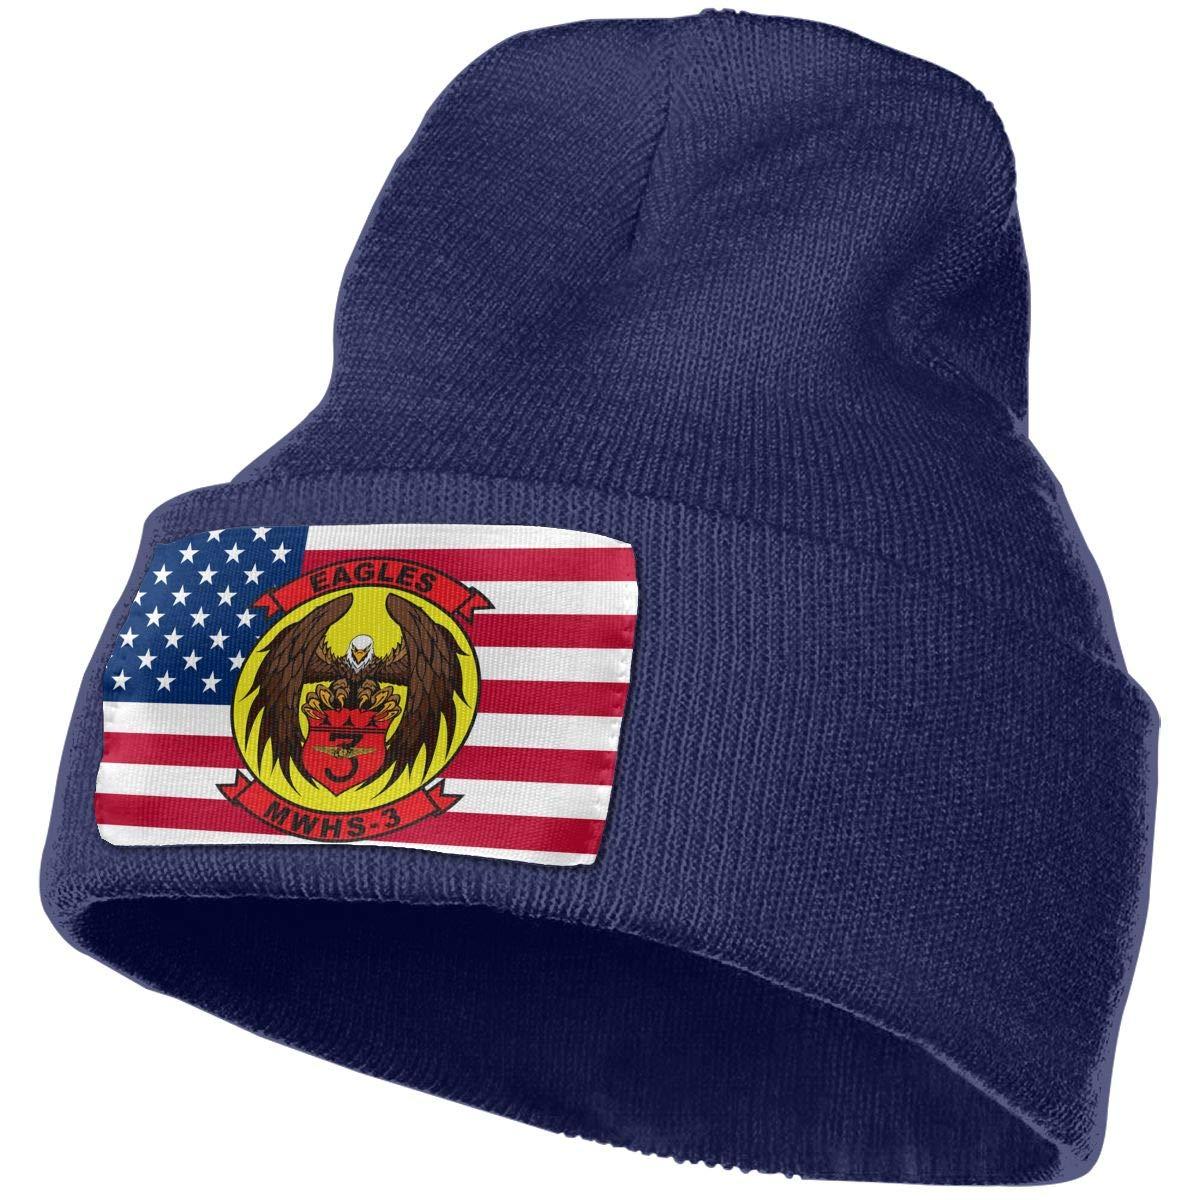 Marine Wing Headquarters Squadron 3 Men/&Women Warm Winter Knit Plain Beanie Hat Skull Cap Acrylic Knit Cuff Hat